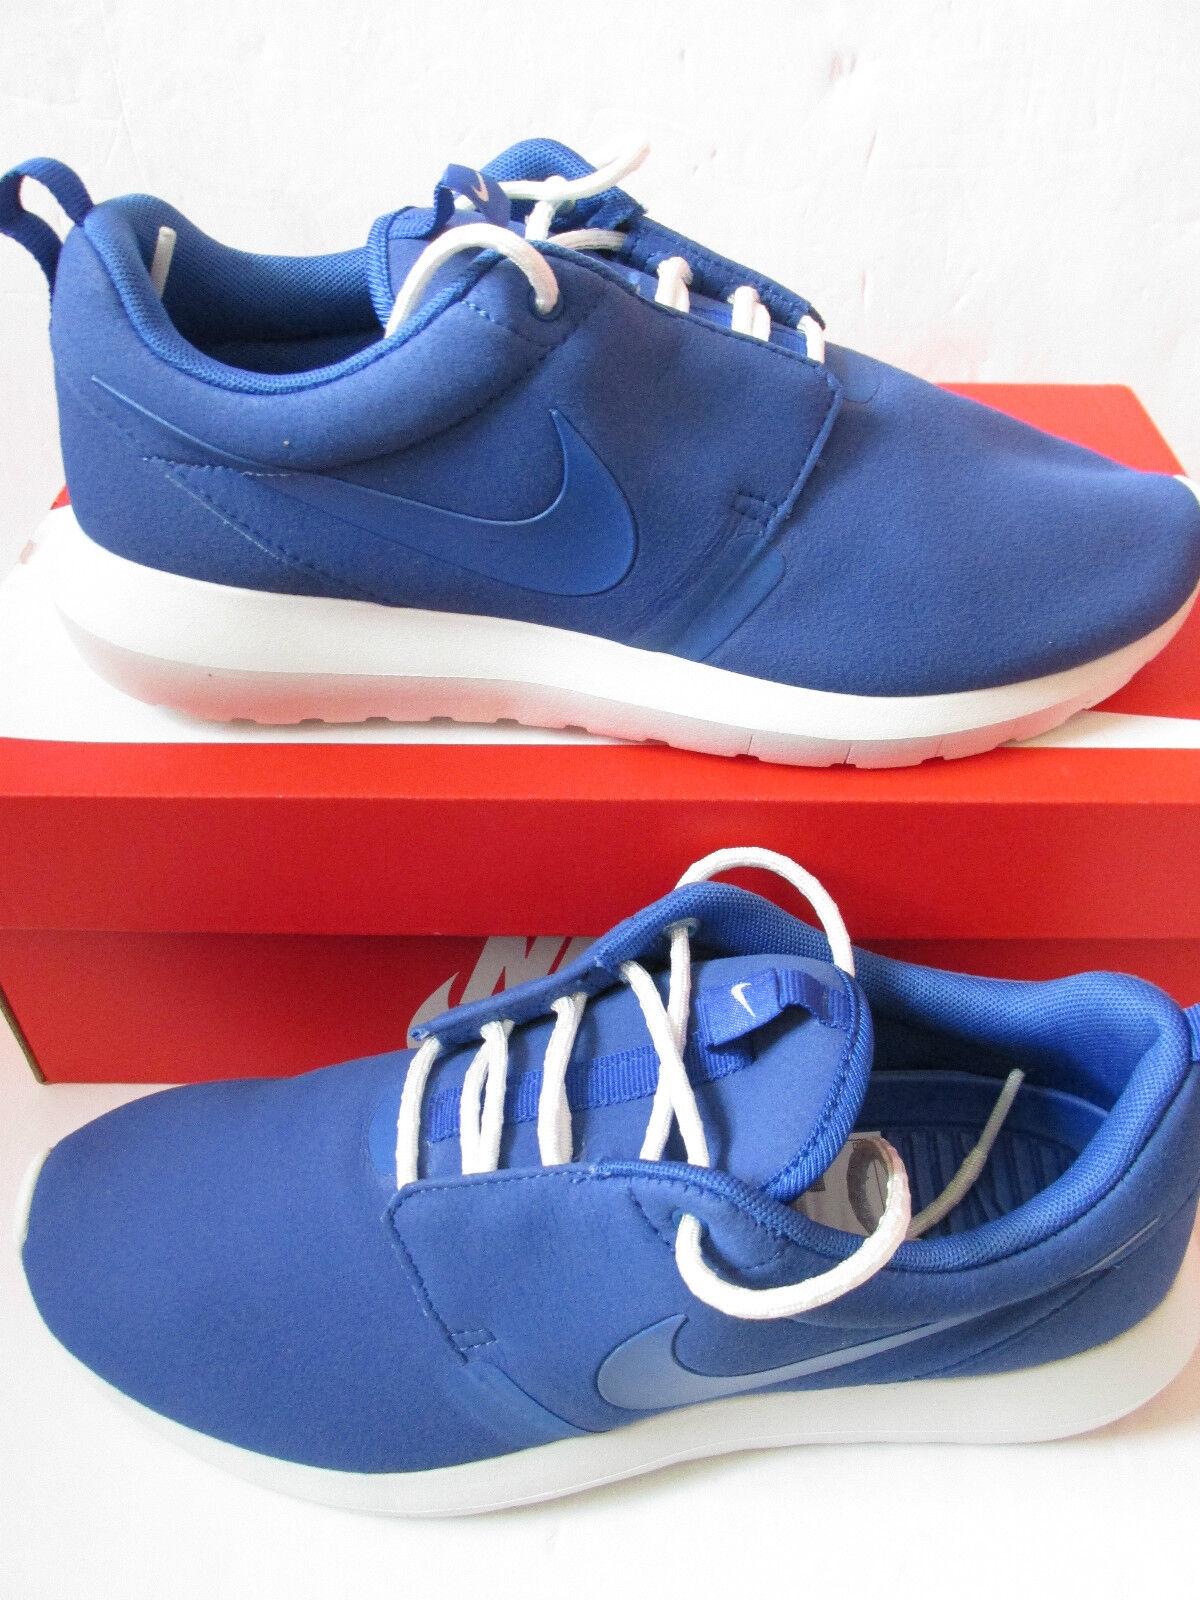 nike trainers rosherun NM mens trainers nike 631749 441 sneakers shoes edb190